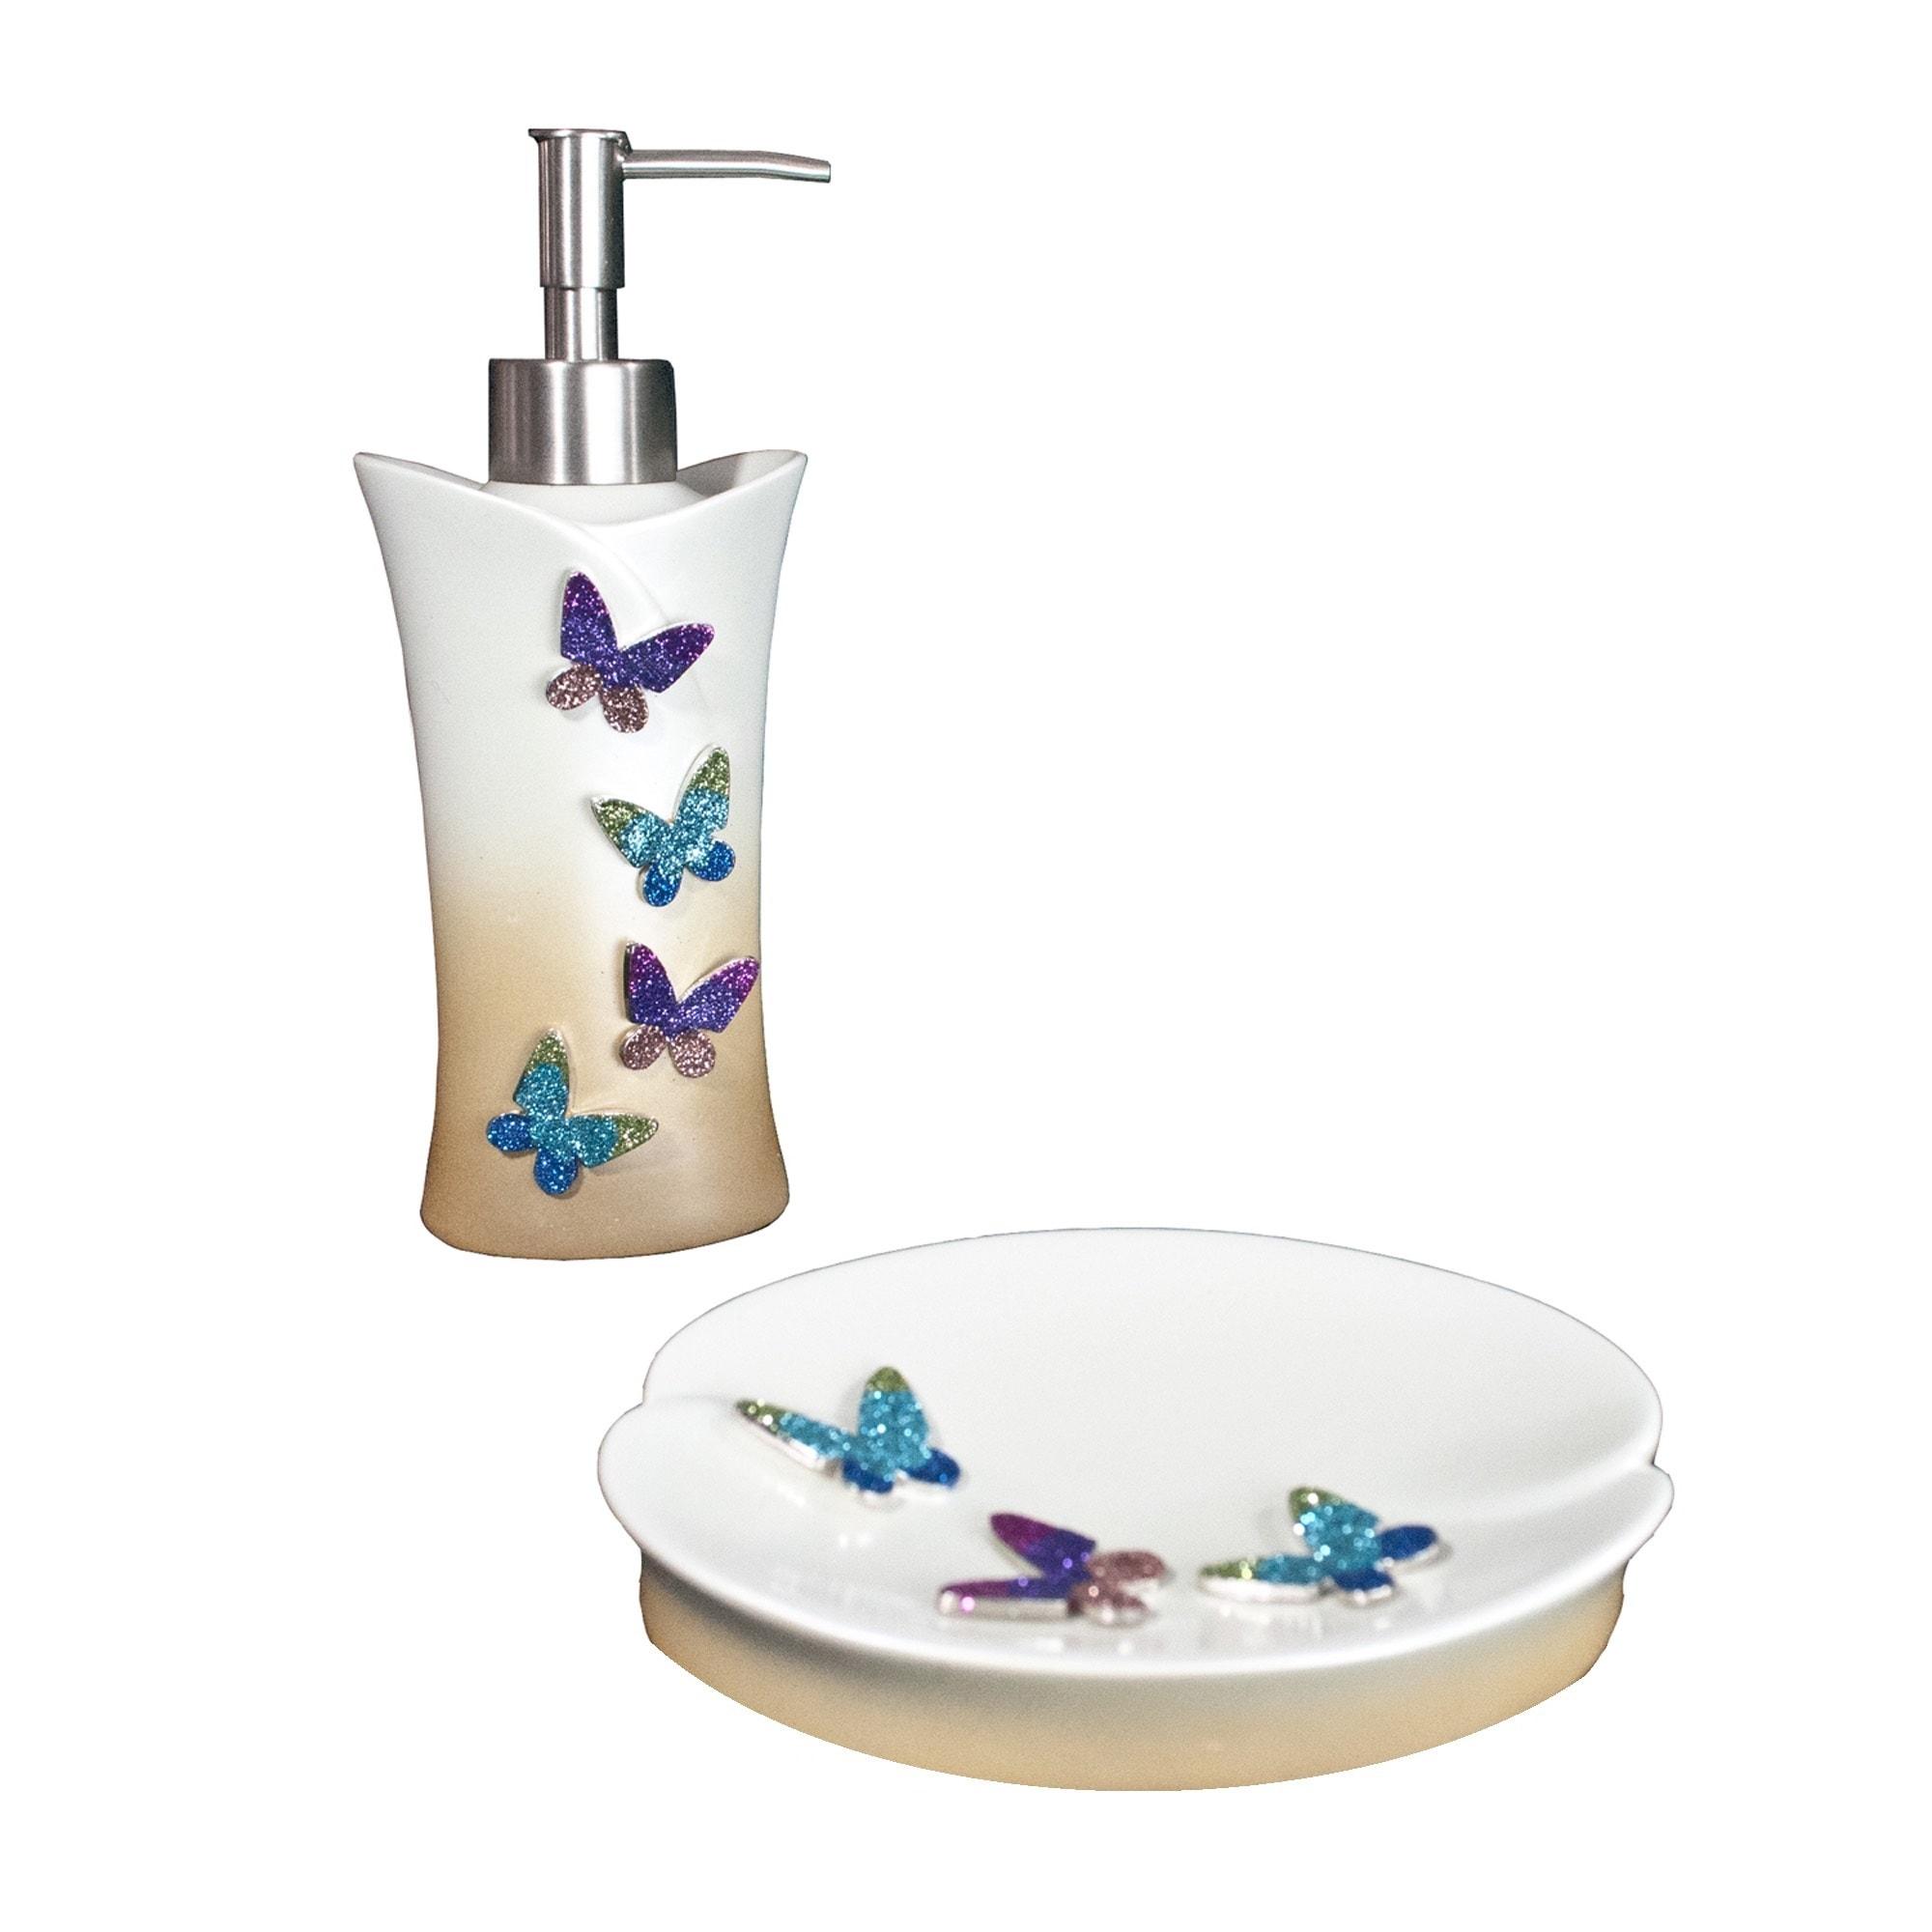 Sherry Kline Bathroom Accessories | Find Great Bath & Towels Deals ...